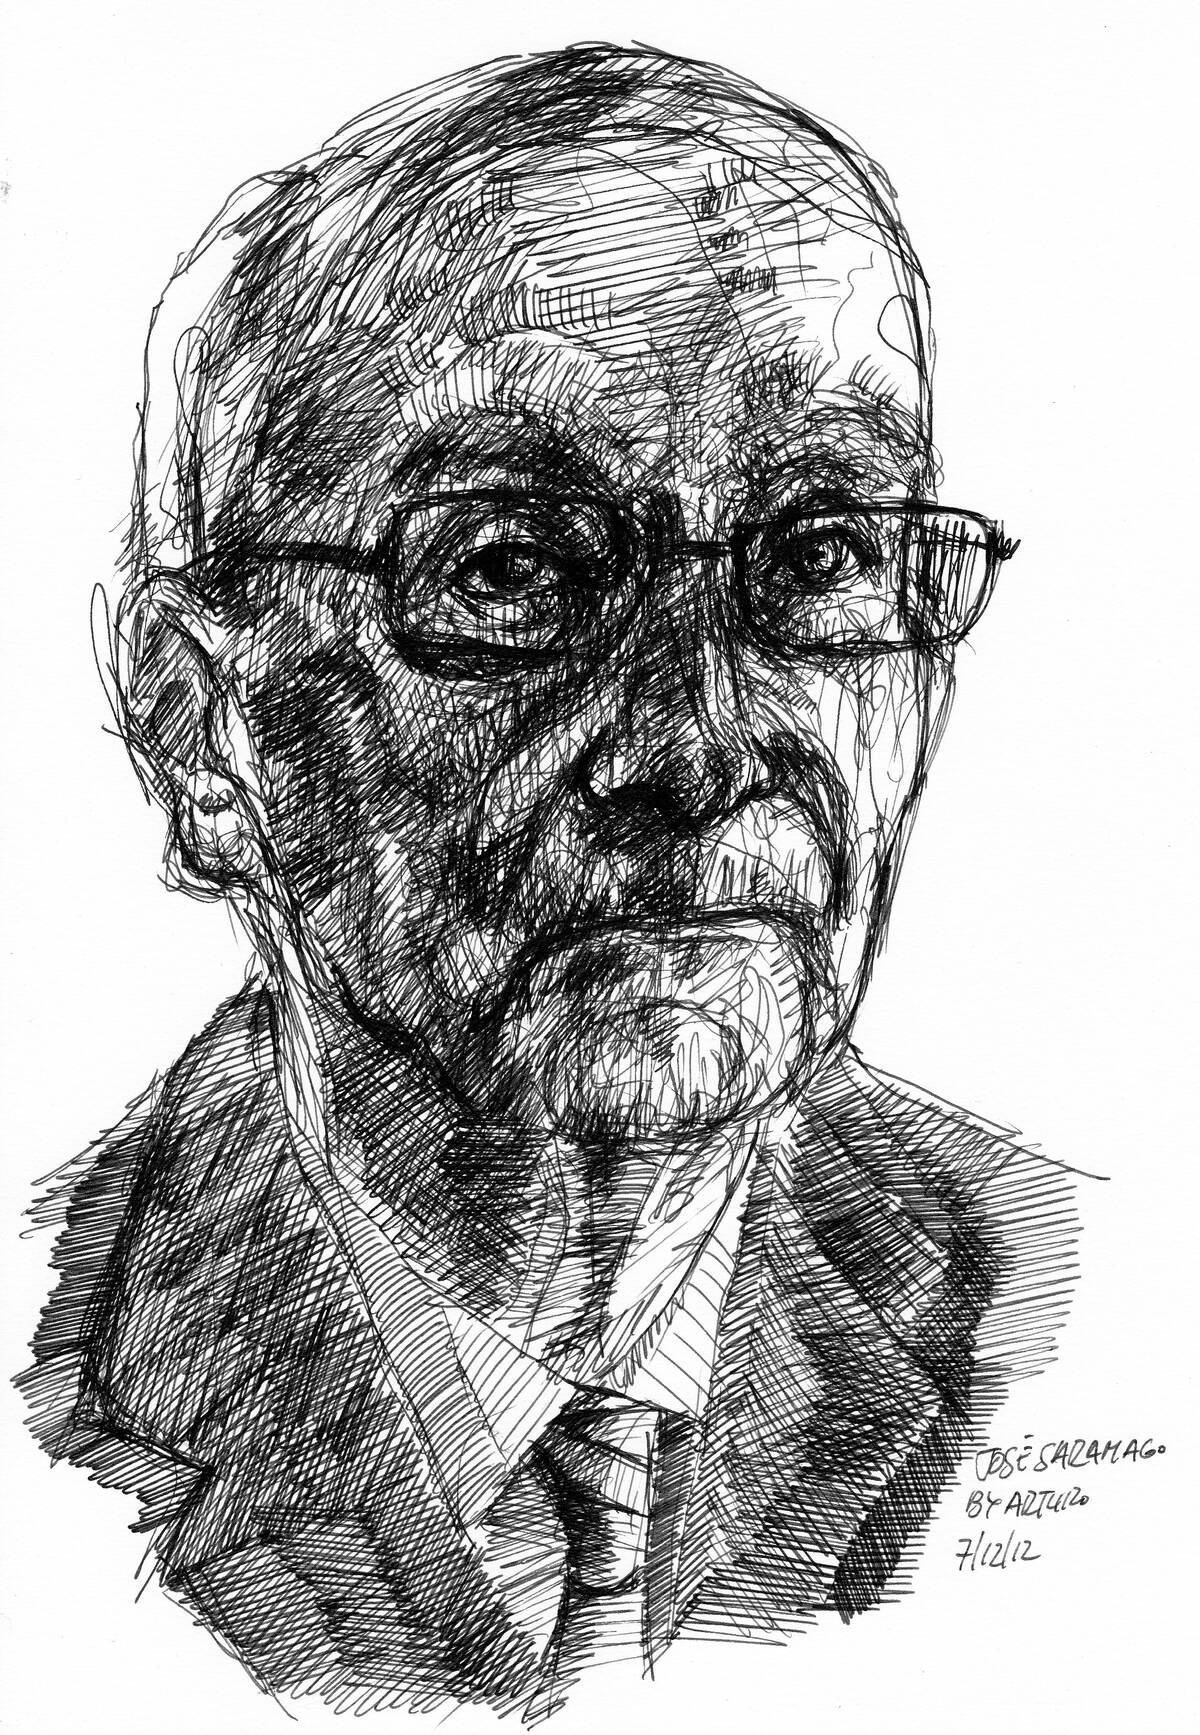 José Saramago for PIFAL by Arturo